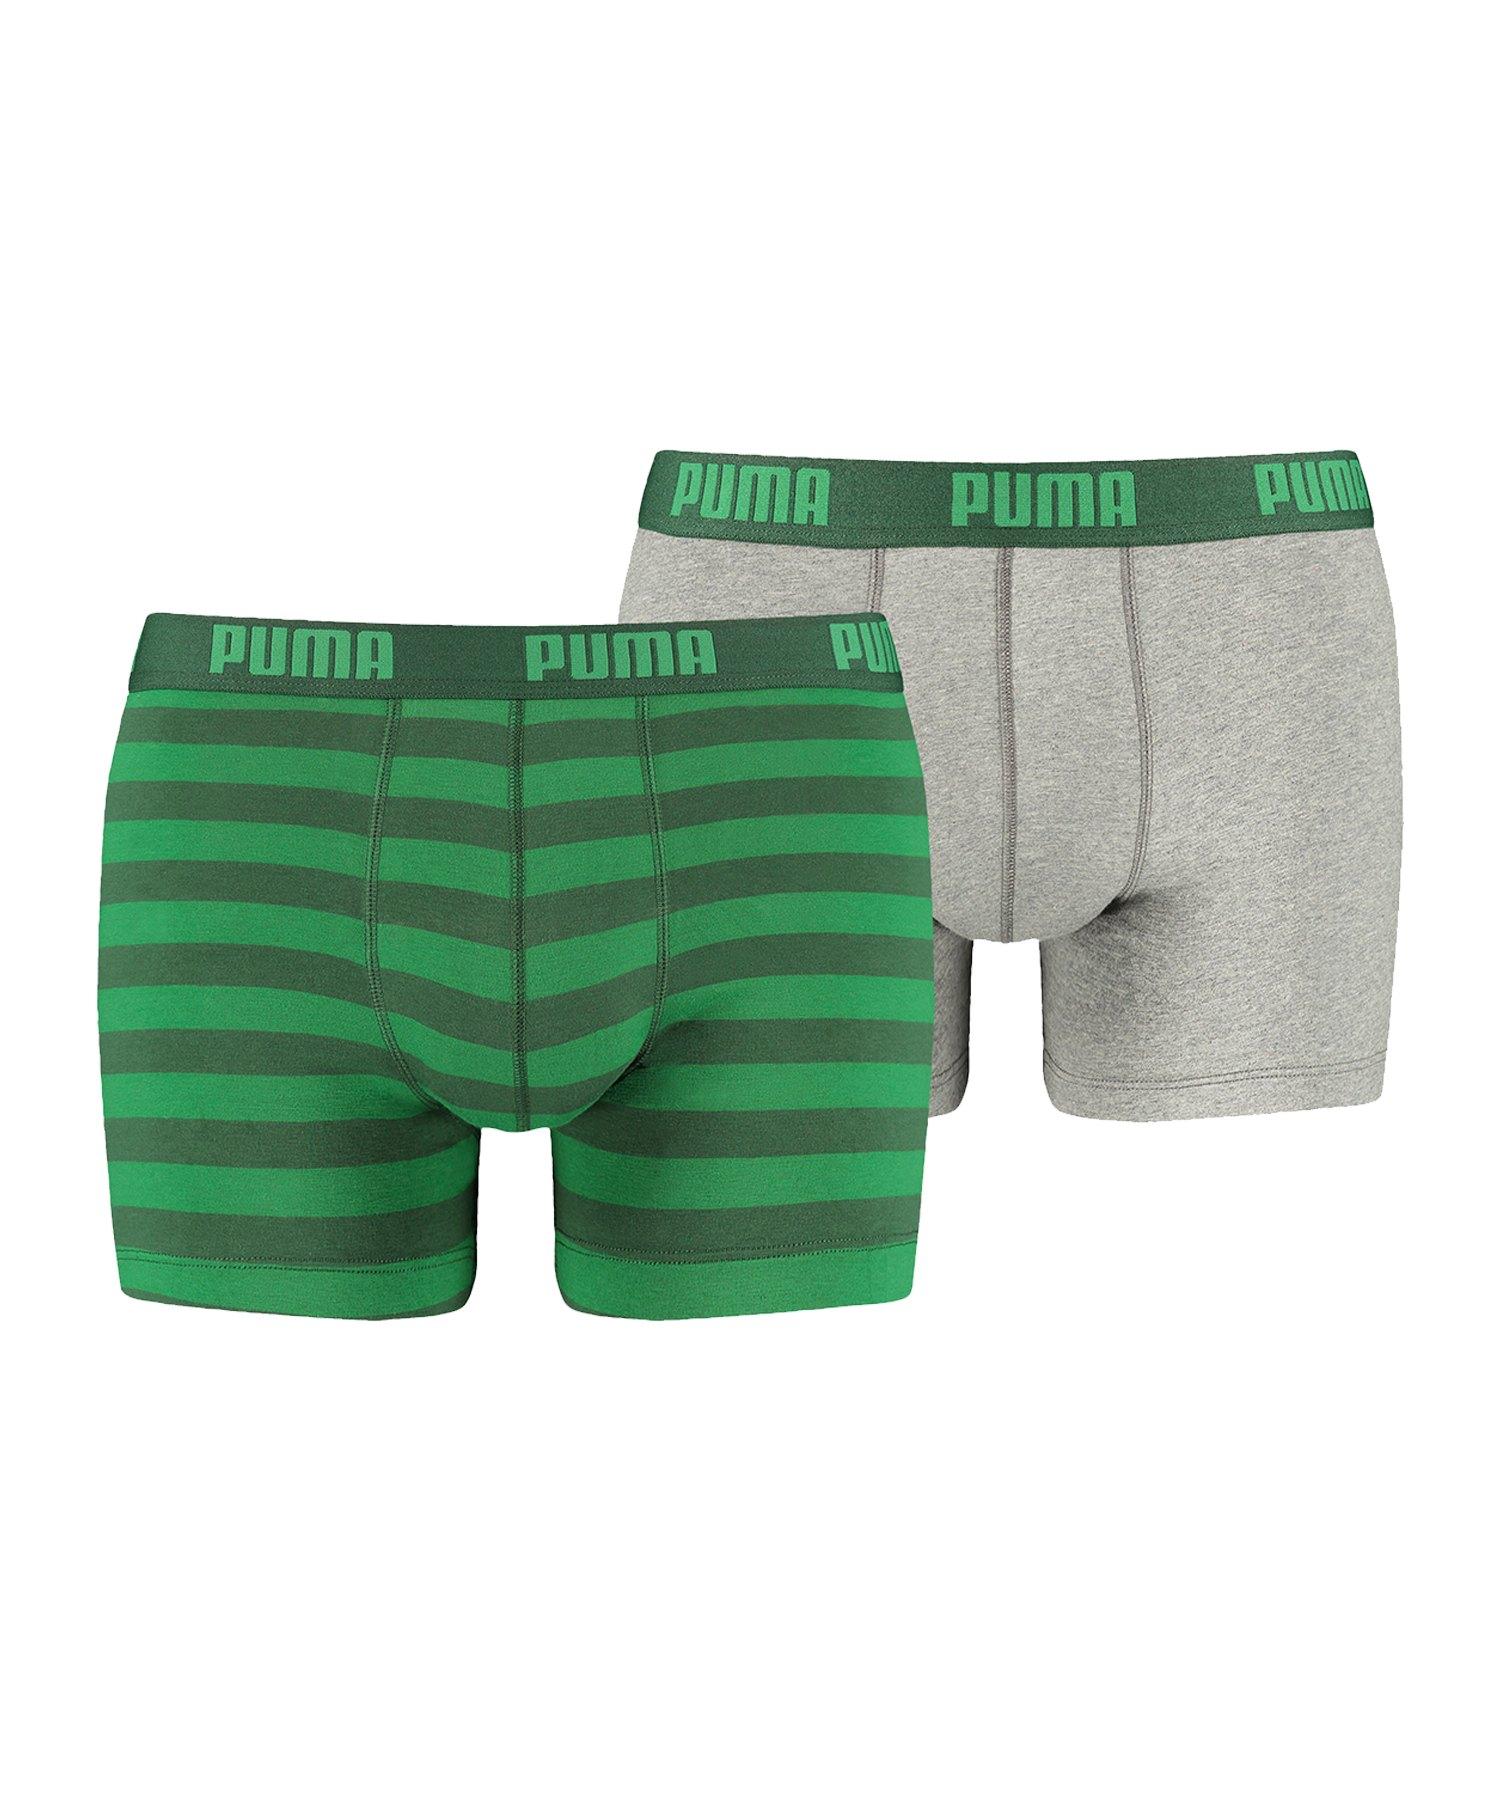 PUMA Stripe Boxer 2er Pack Mens Grün F327 - gruen